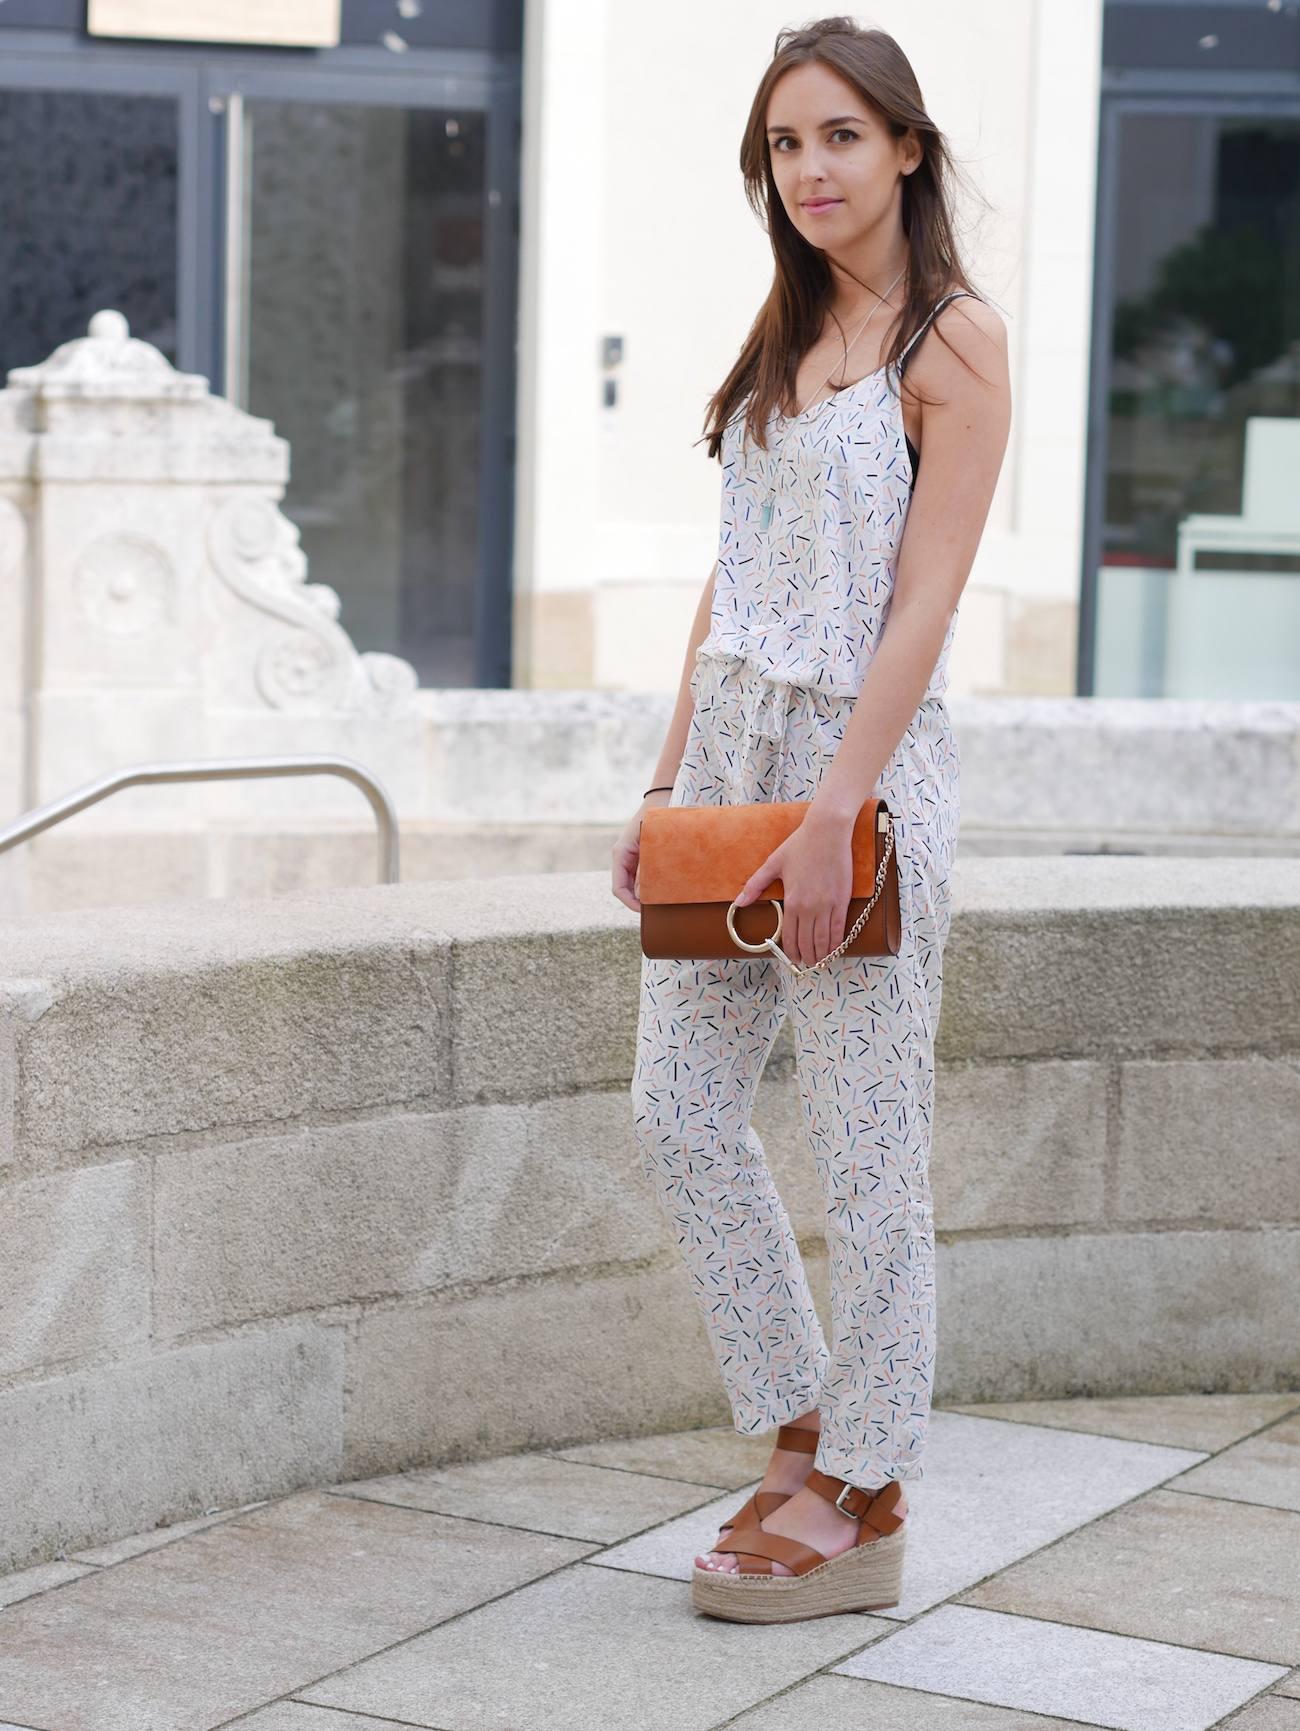 Blog Mode - Combi princesse tam tam & Faye Chloé - Nolwenn C 11